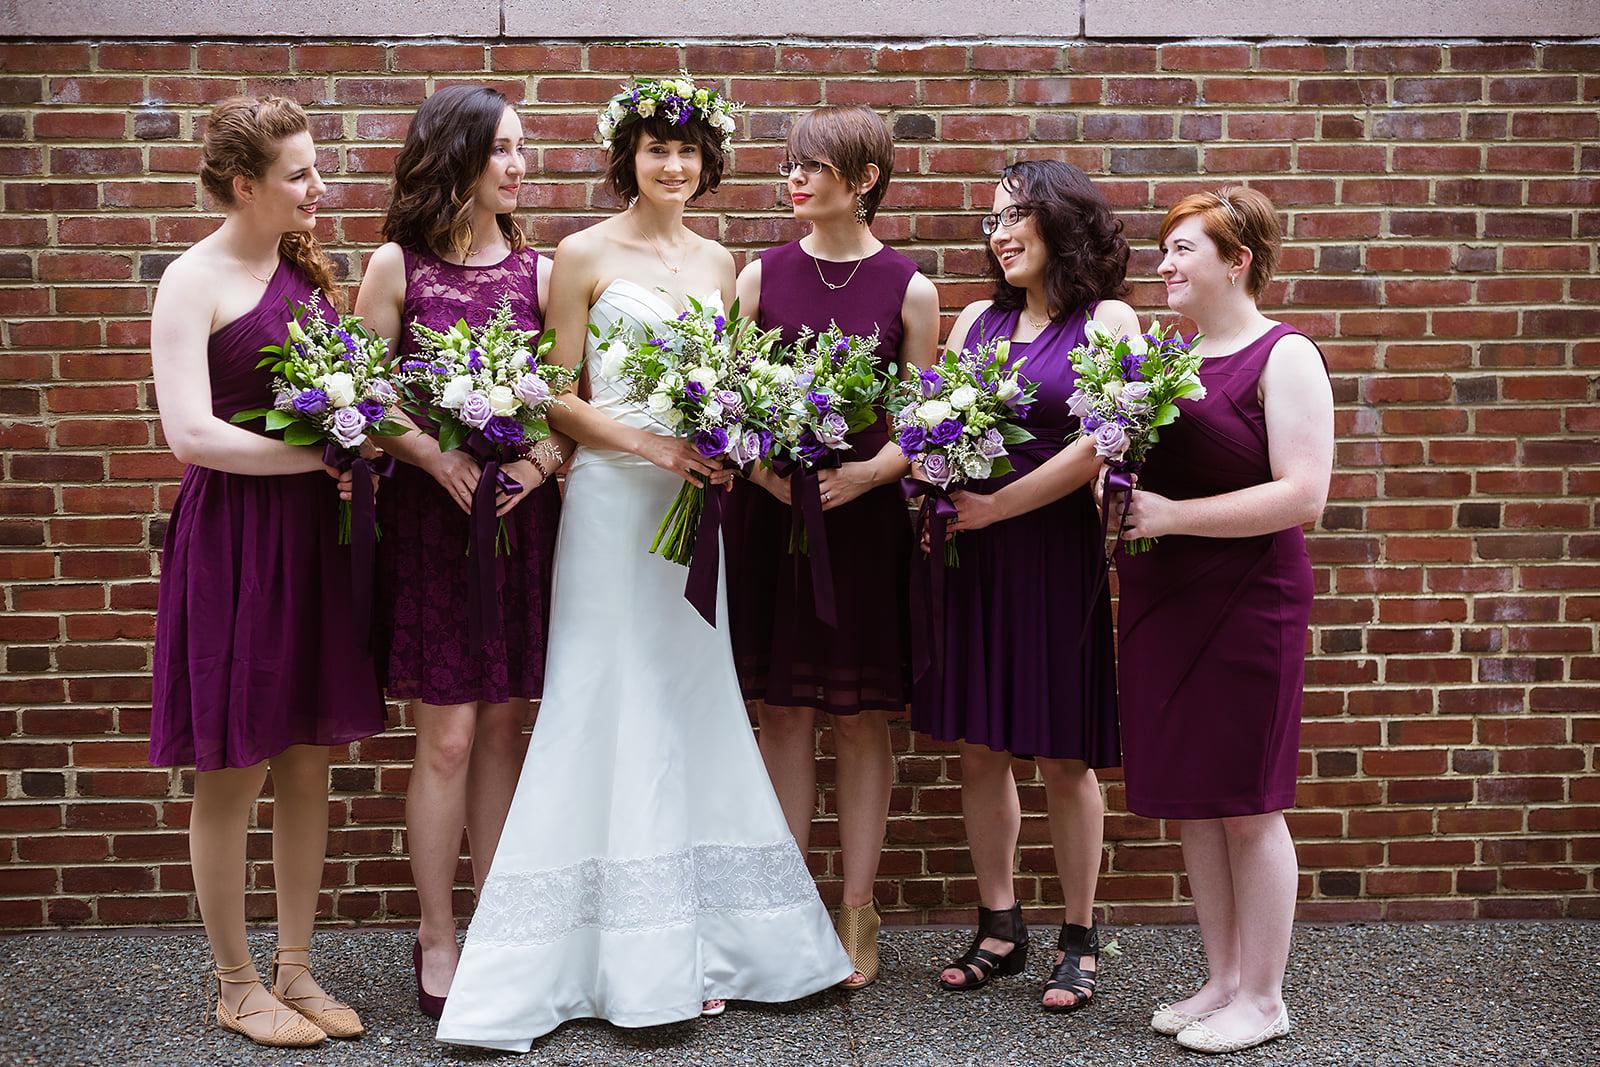 Blacano Wedding - Formals-3.jpg